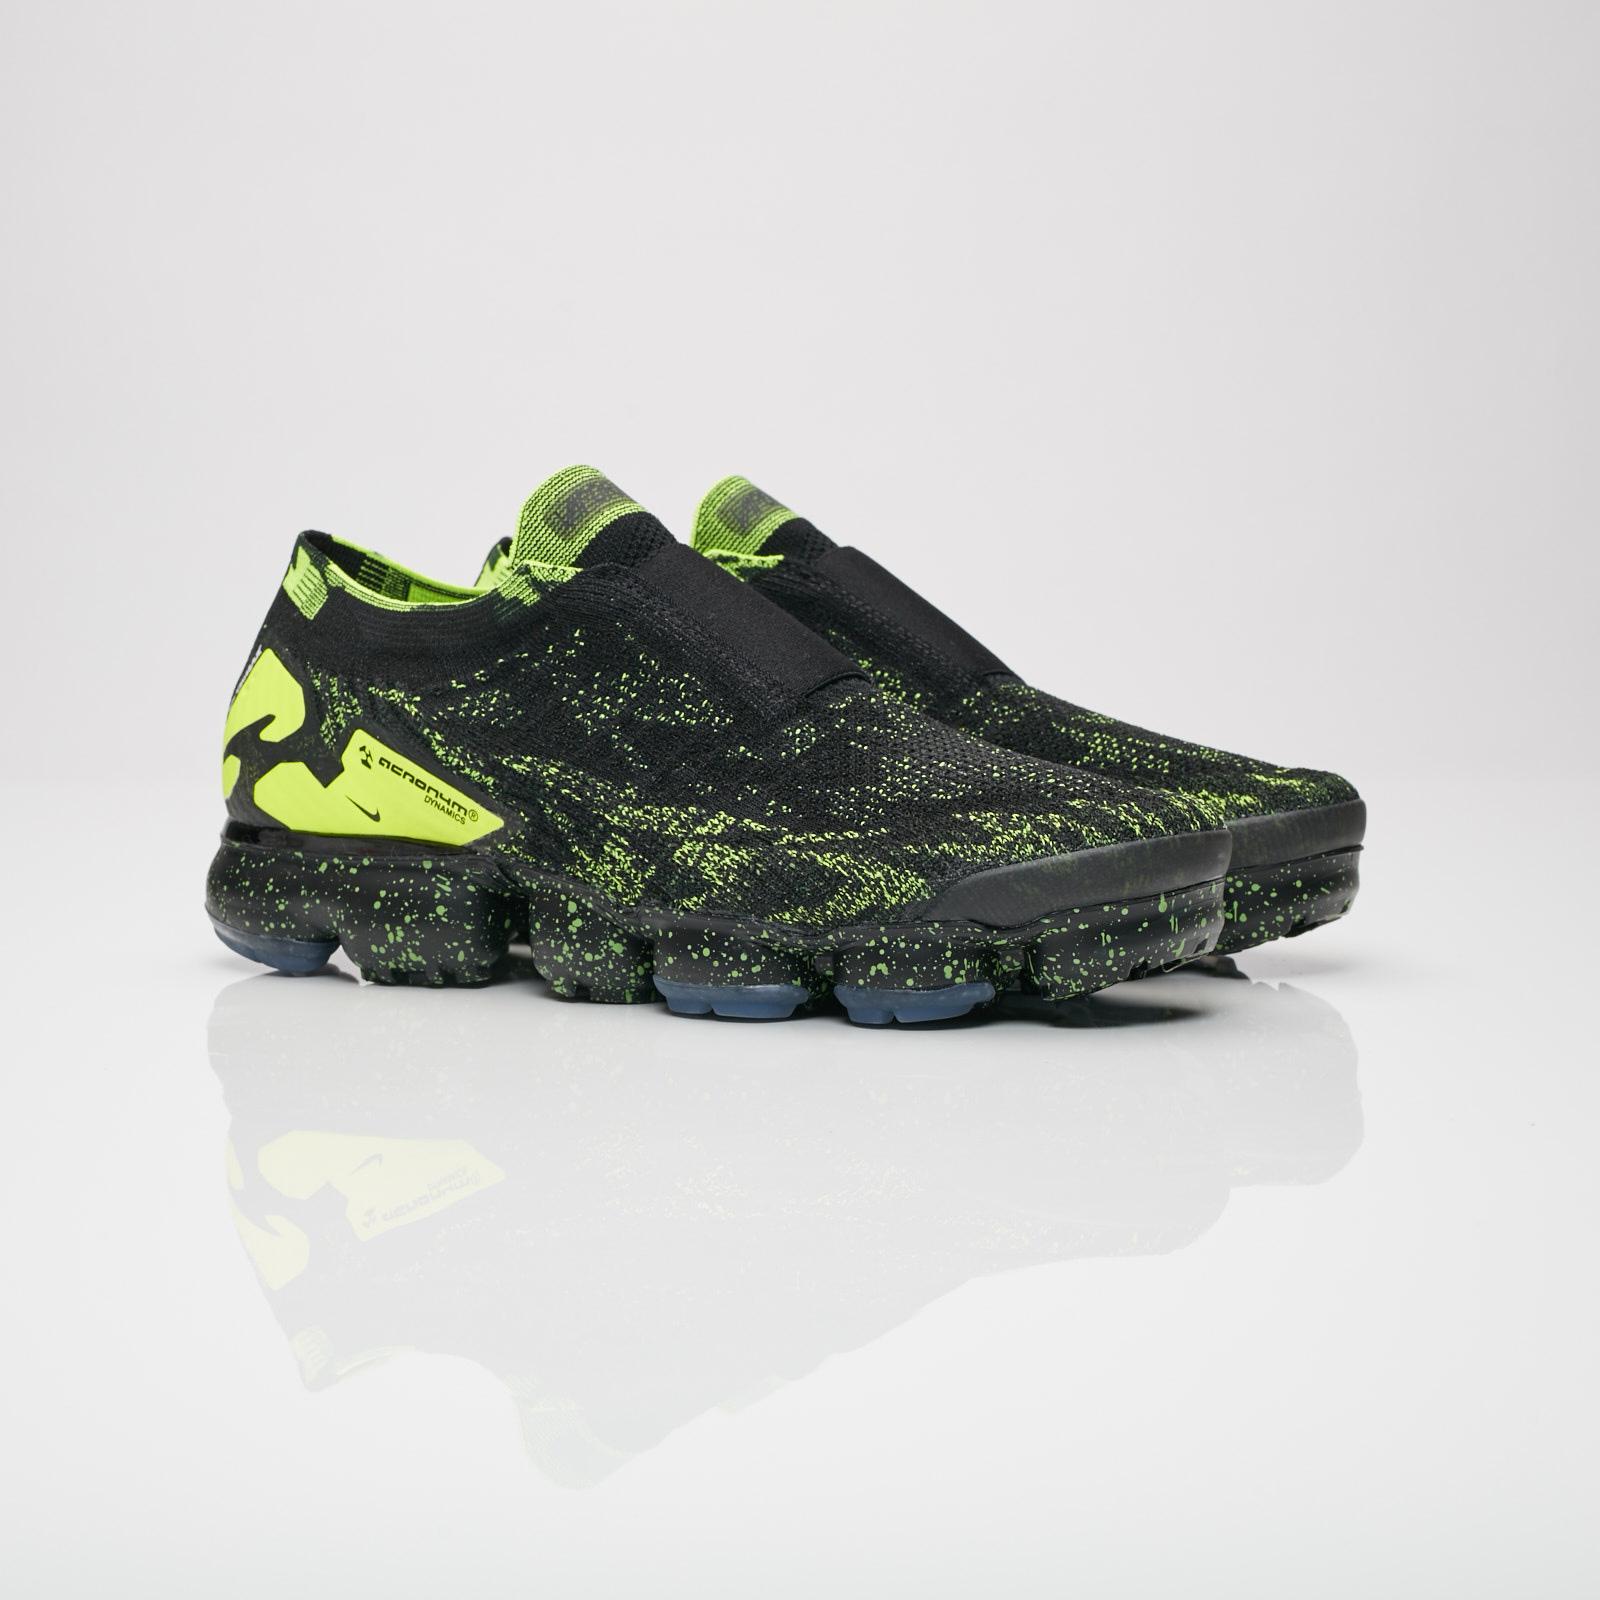 ce239cf6b9 Nike Air Vapormax FK Moc 2 / Acronym - Aq0996-007 - Sneakersnstuff ...